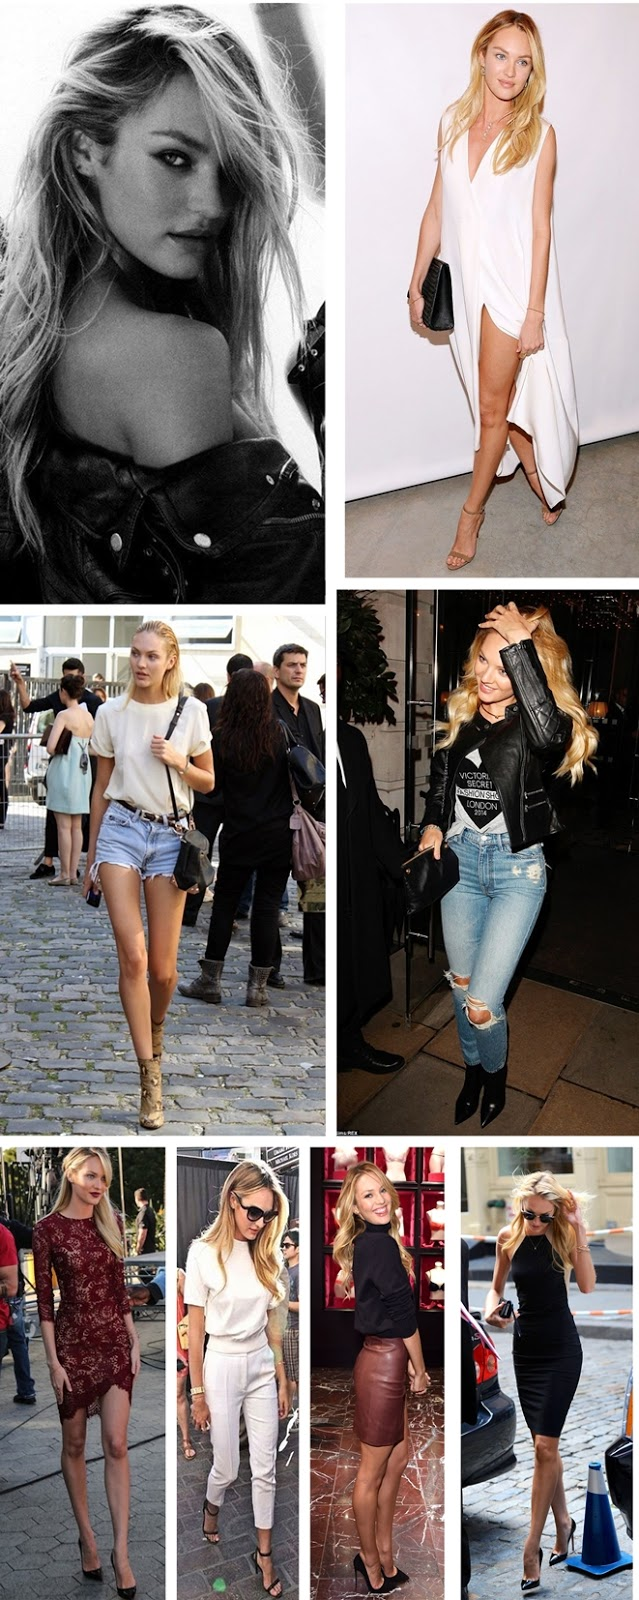 candice swanepoel, victorias angels, street style, candice swanepoel style, beautiful, models